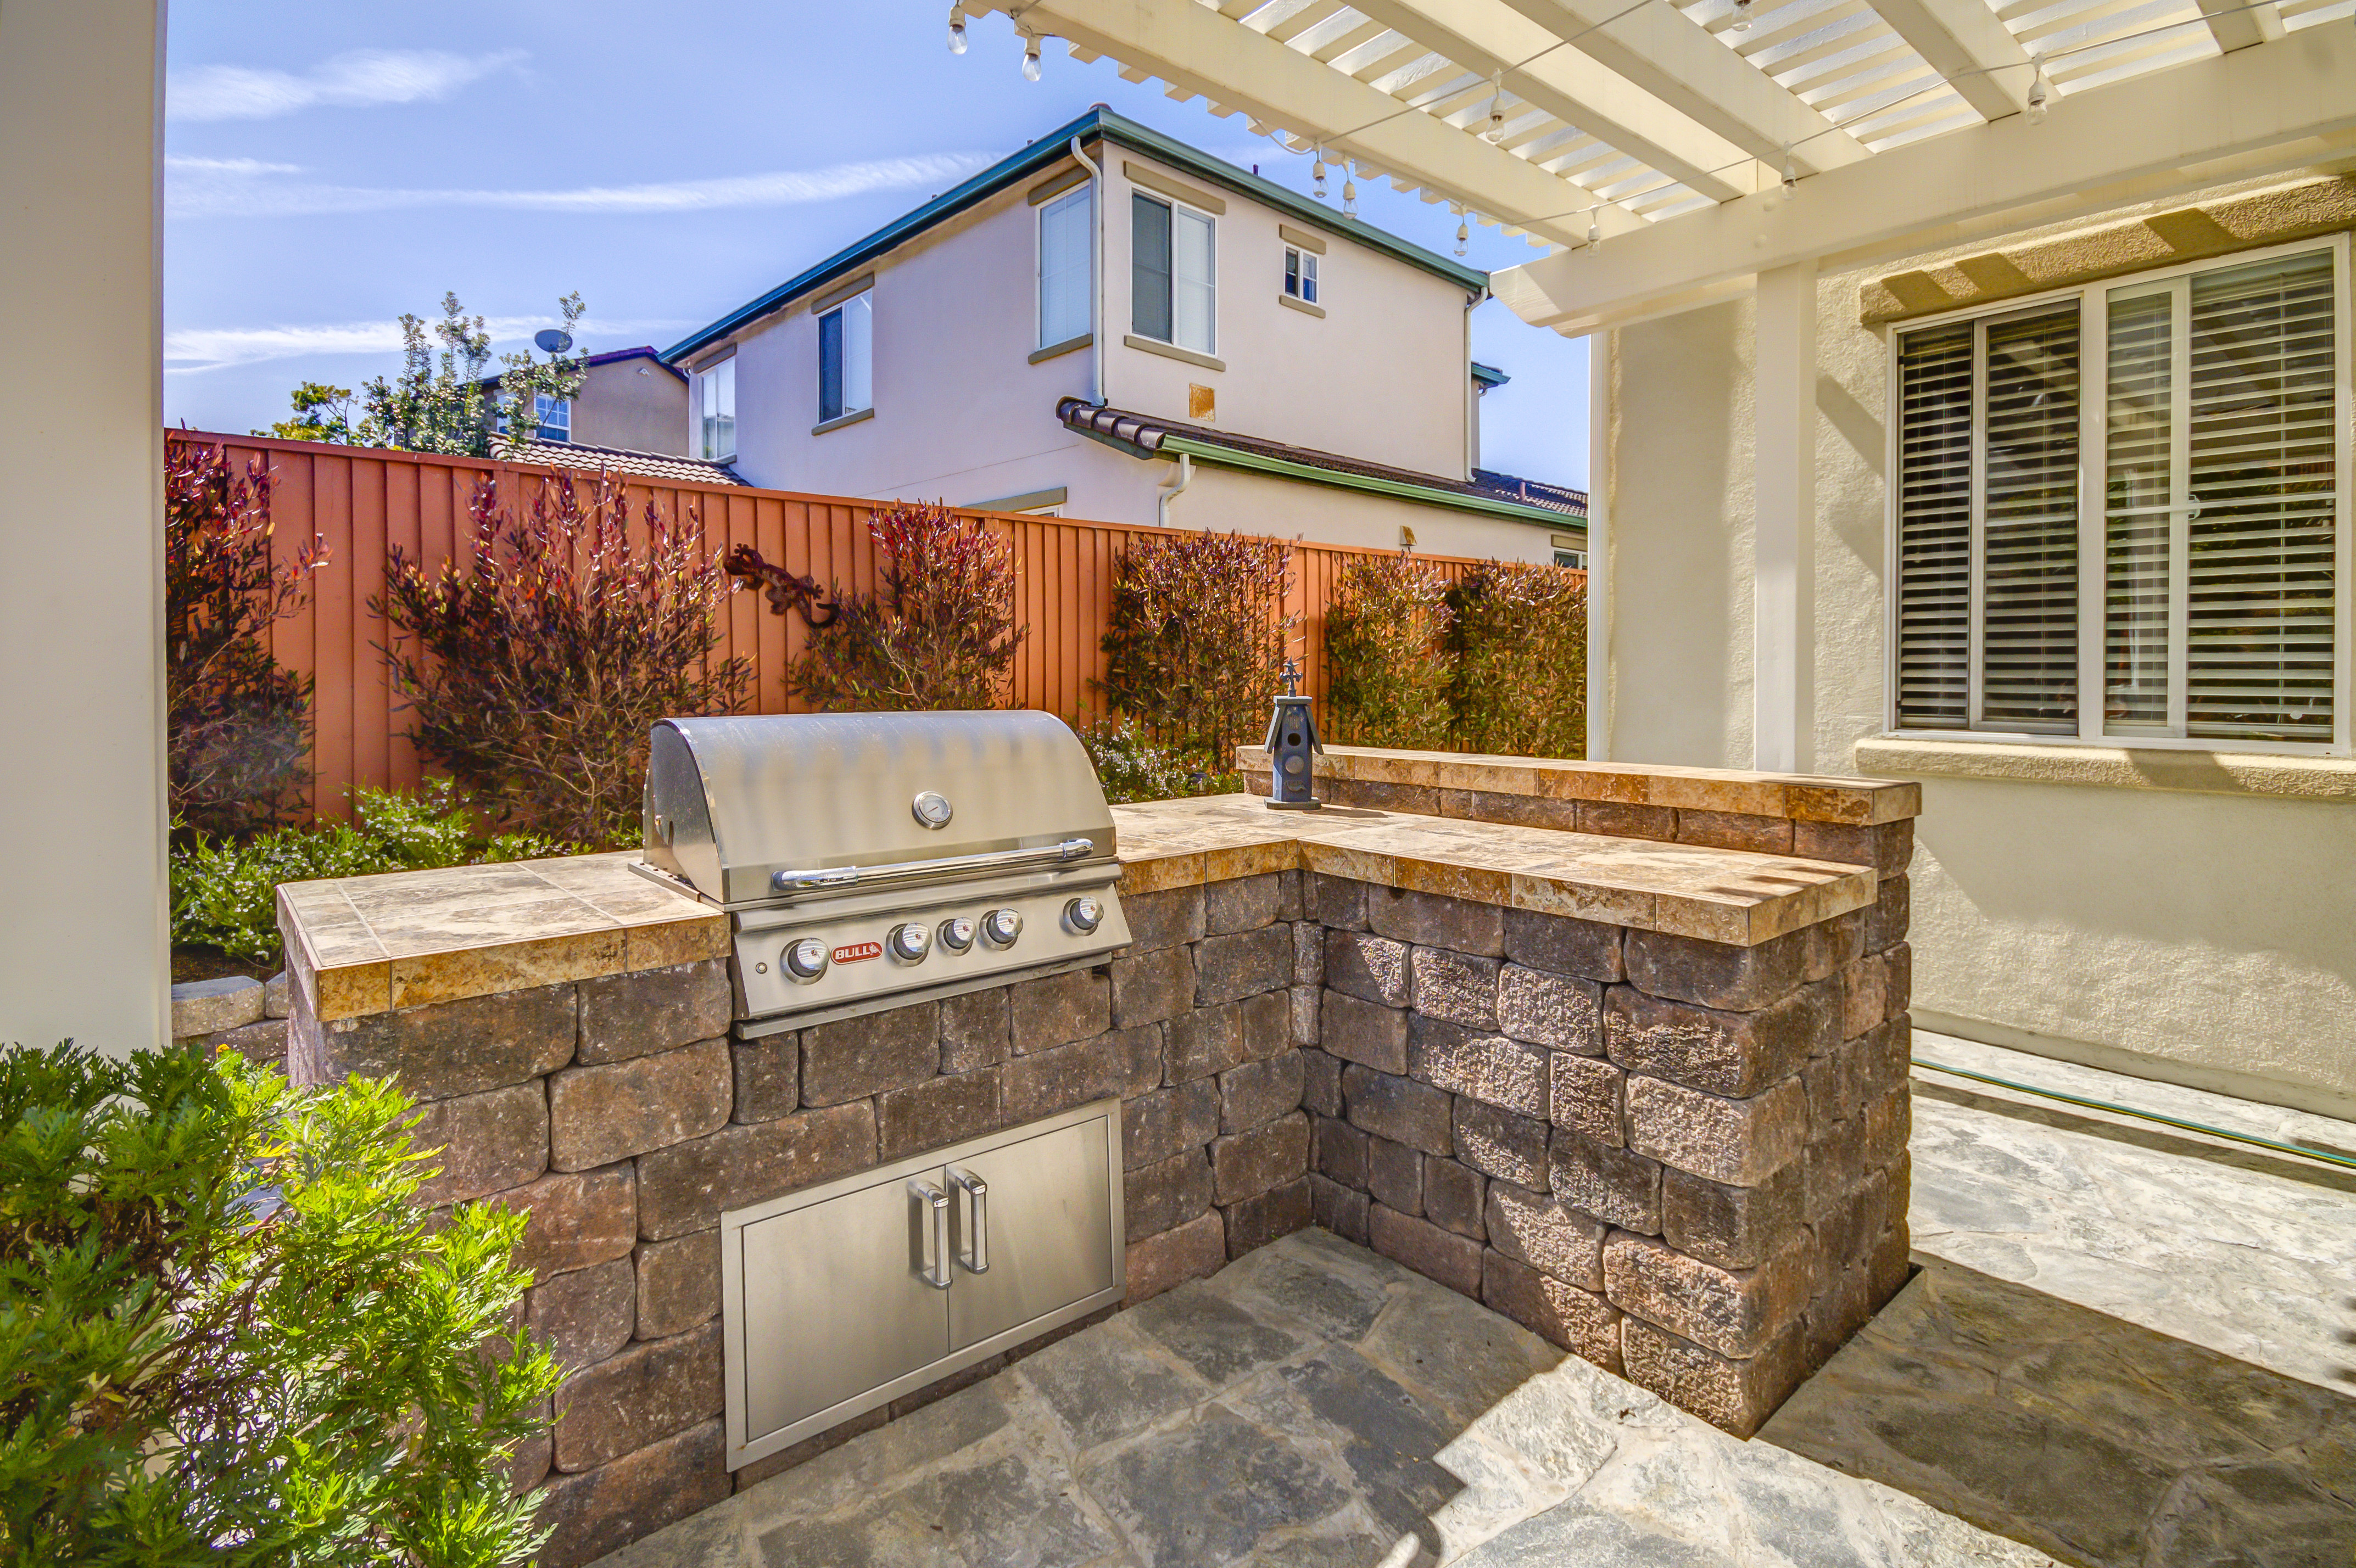 Spacious,Home ideal location/Monterey Peninsula/VRBO #677997 ...